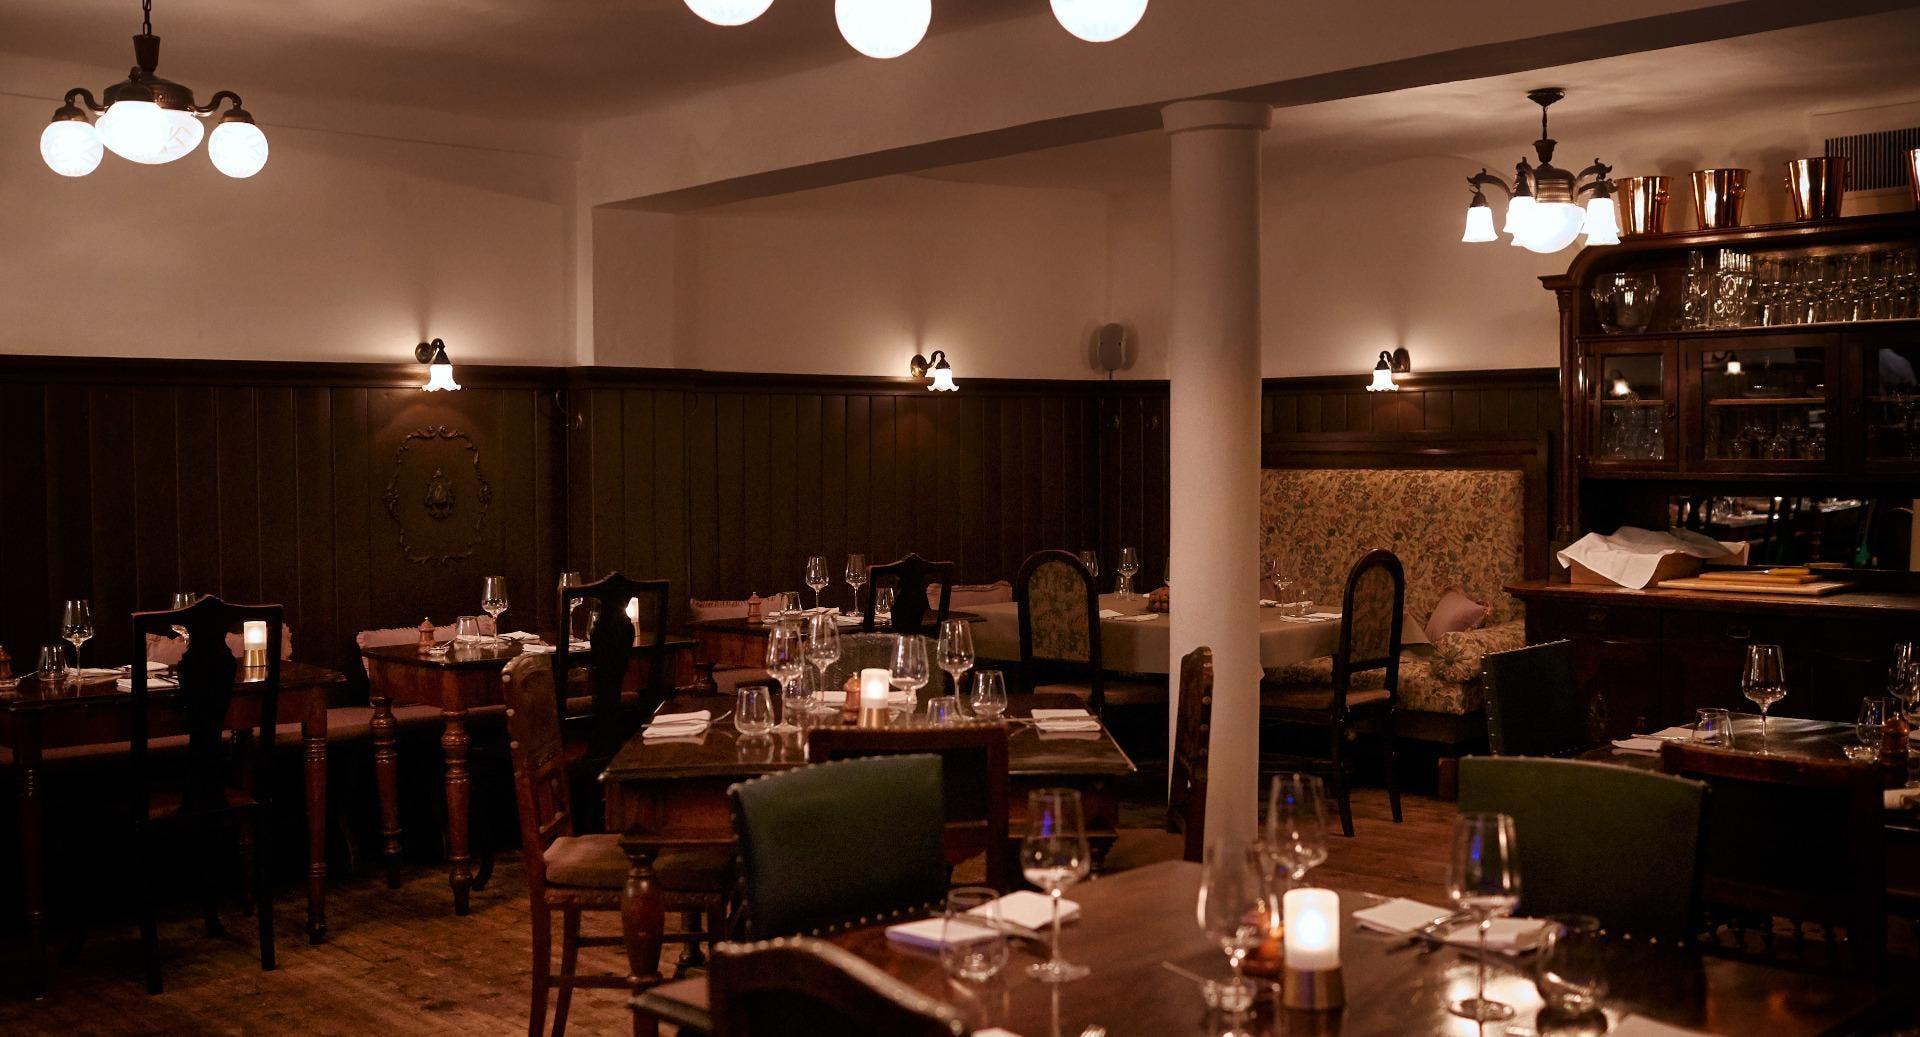 Restaurant Ludwig van